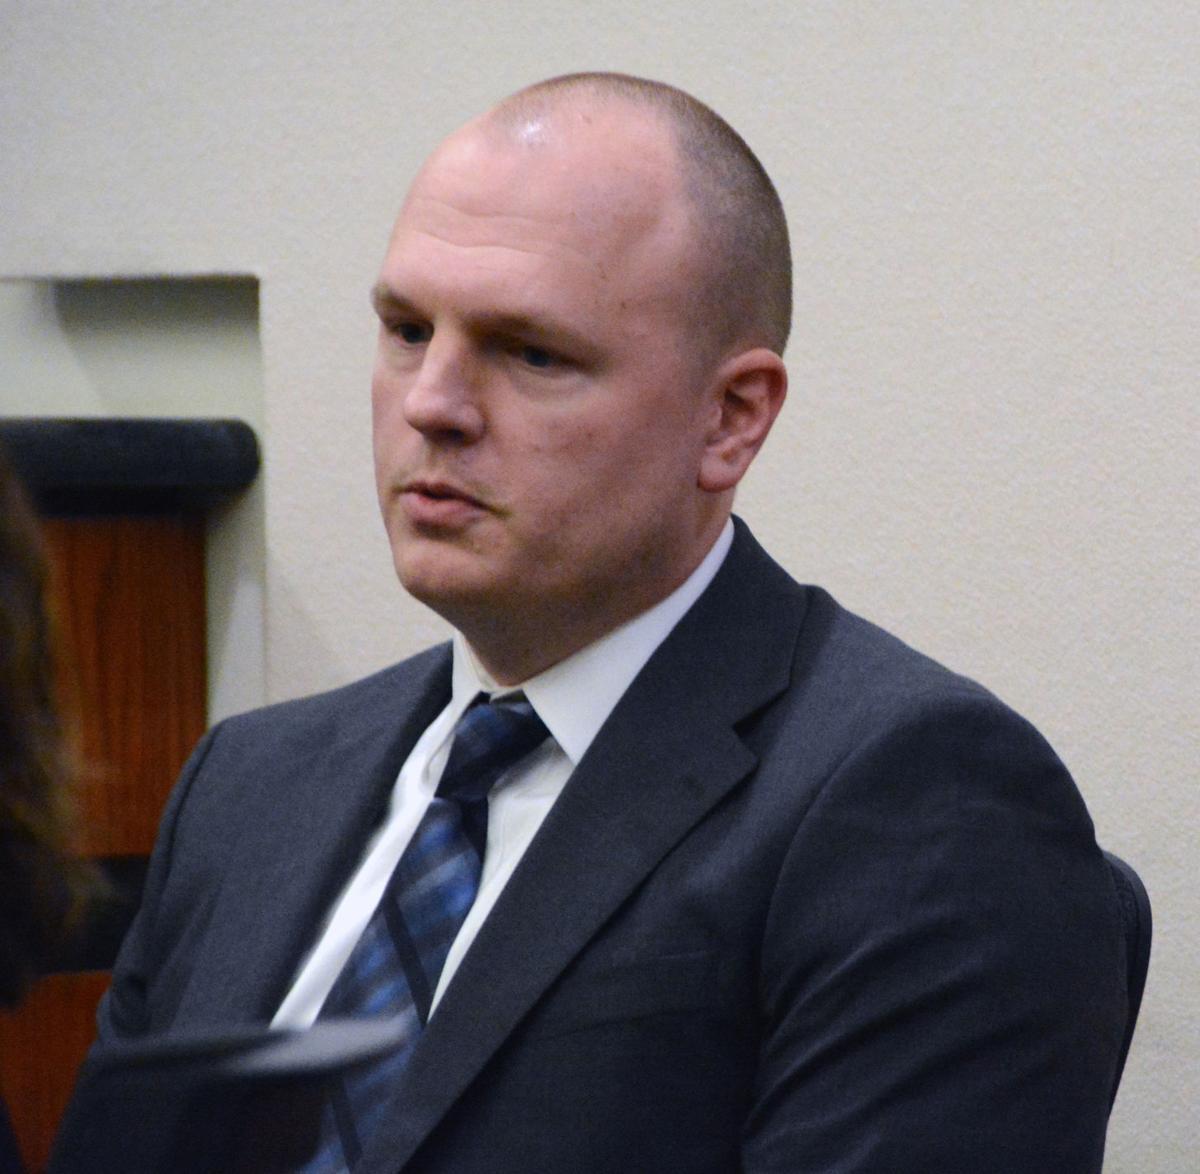 Drew Bulin testifies